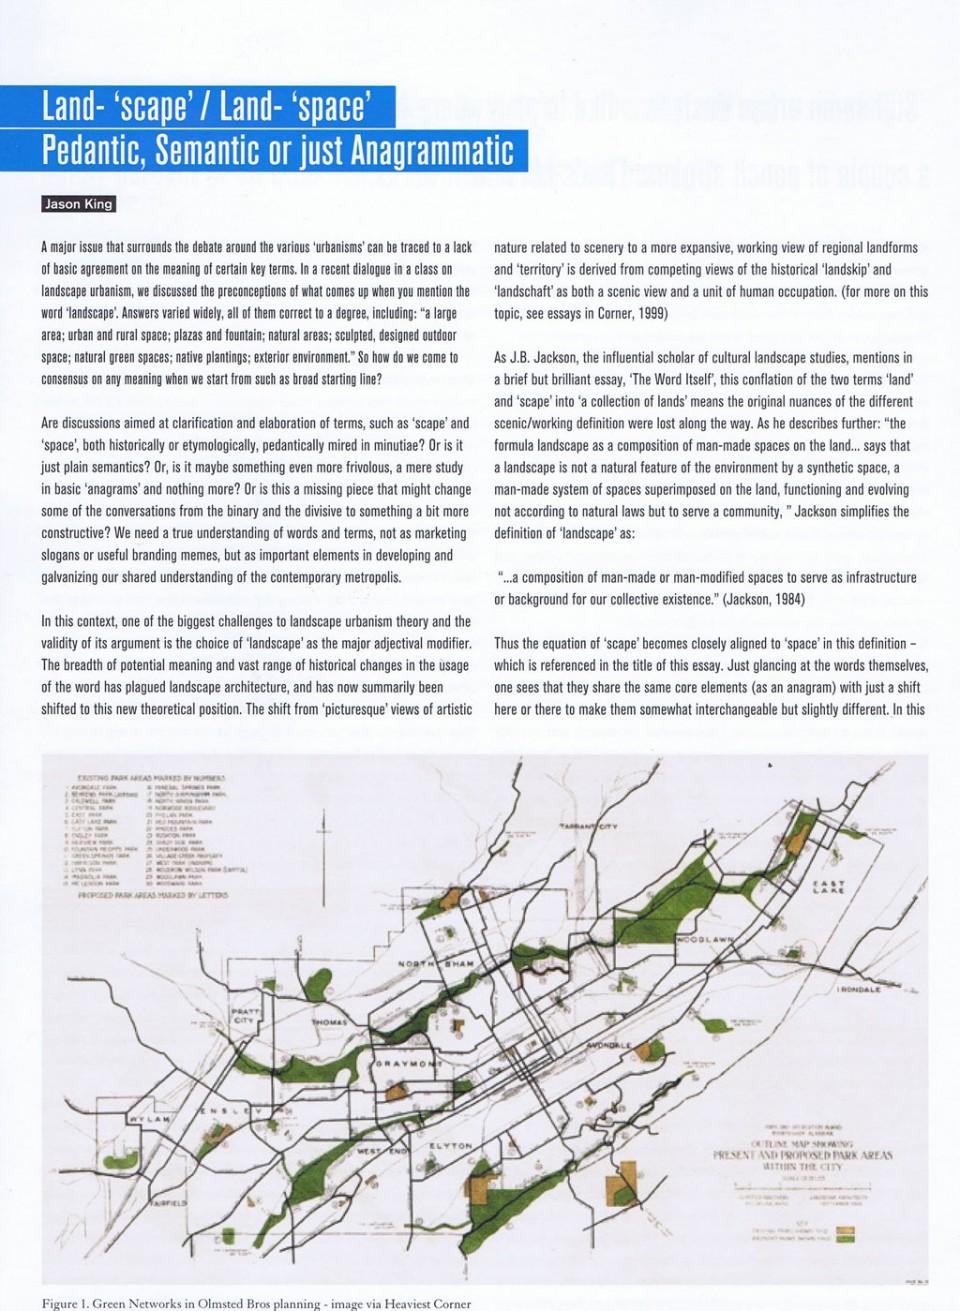 006 Landscape Architecture Essay Atlantis Web Stunning Argumentative Topics 960